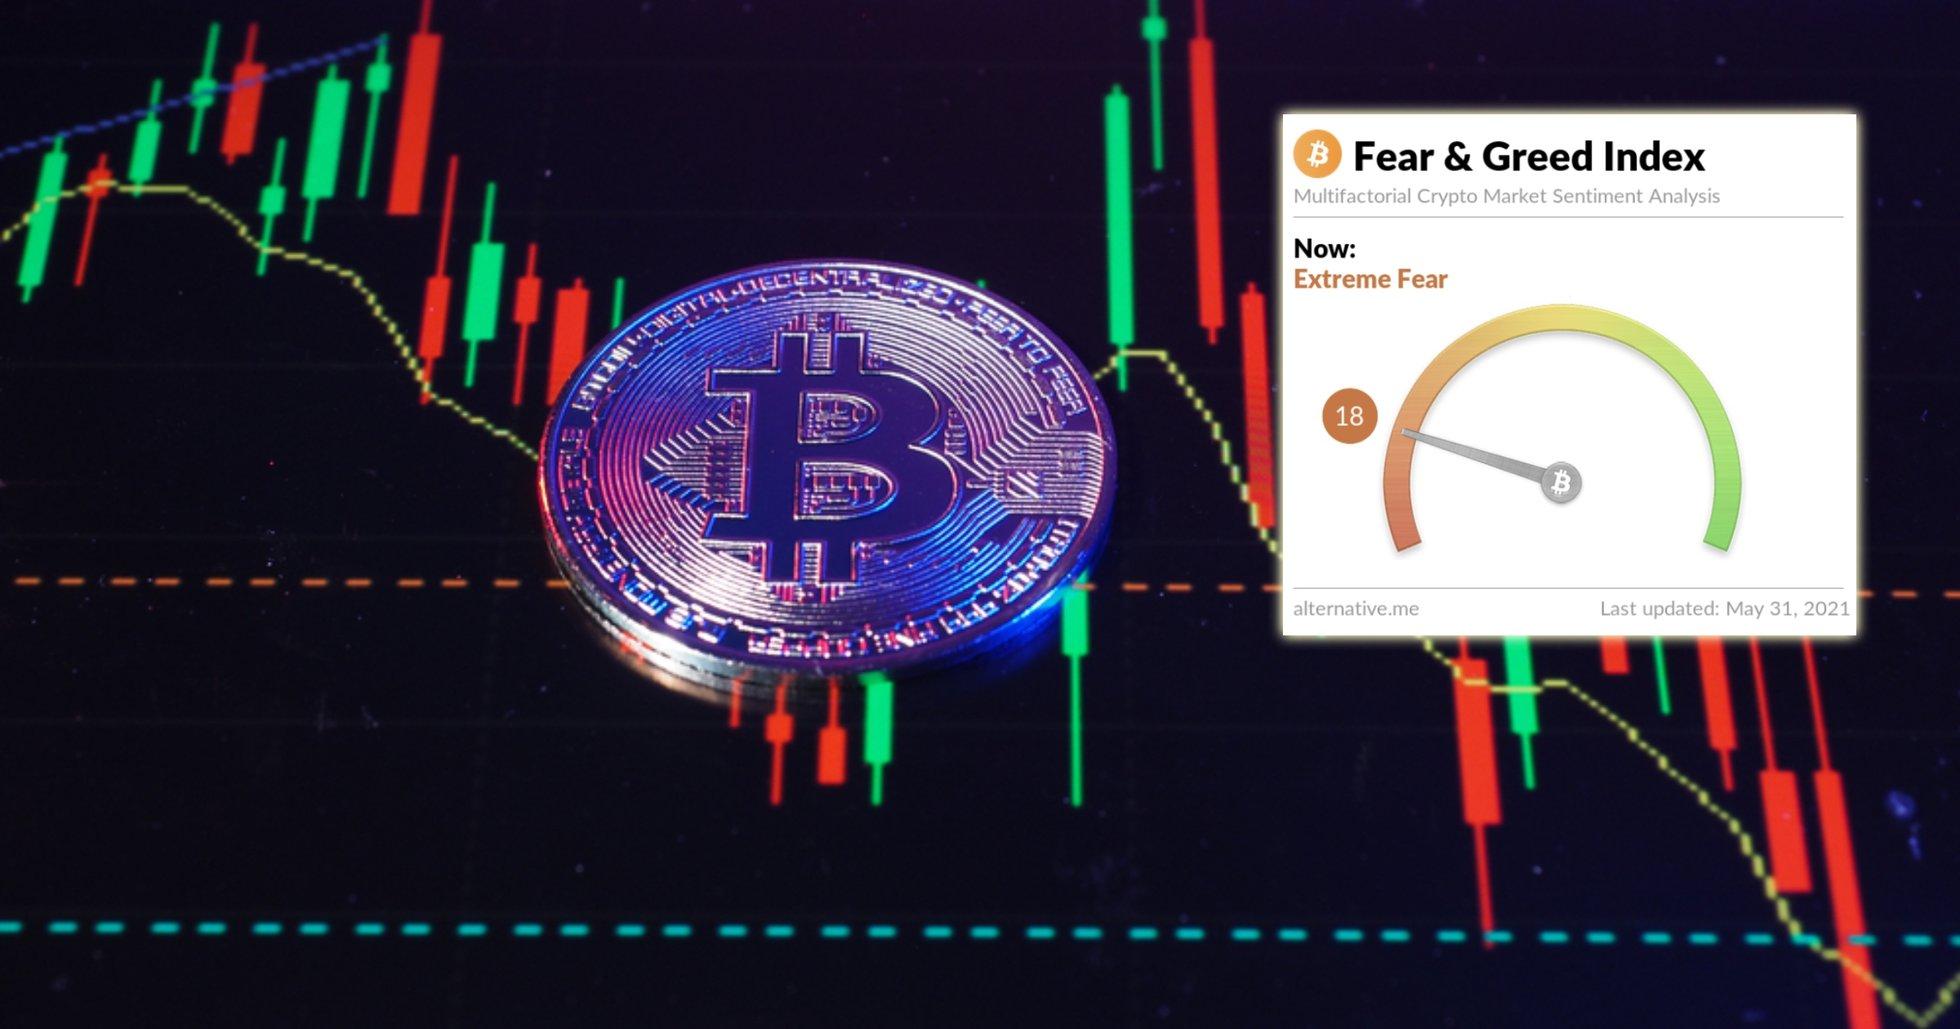 Bitcoinpriset ned 48 procent sedan